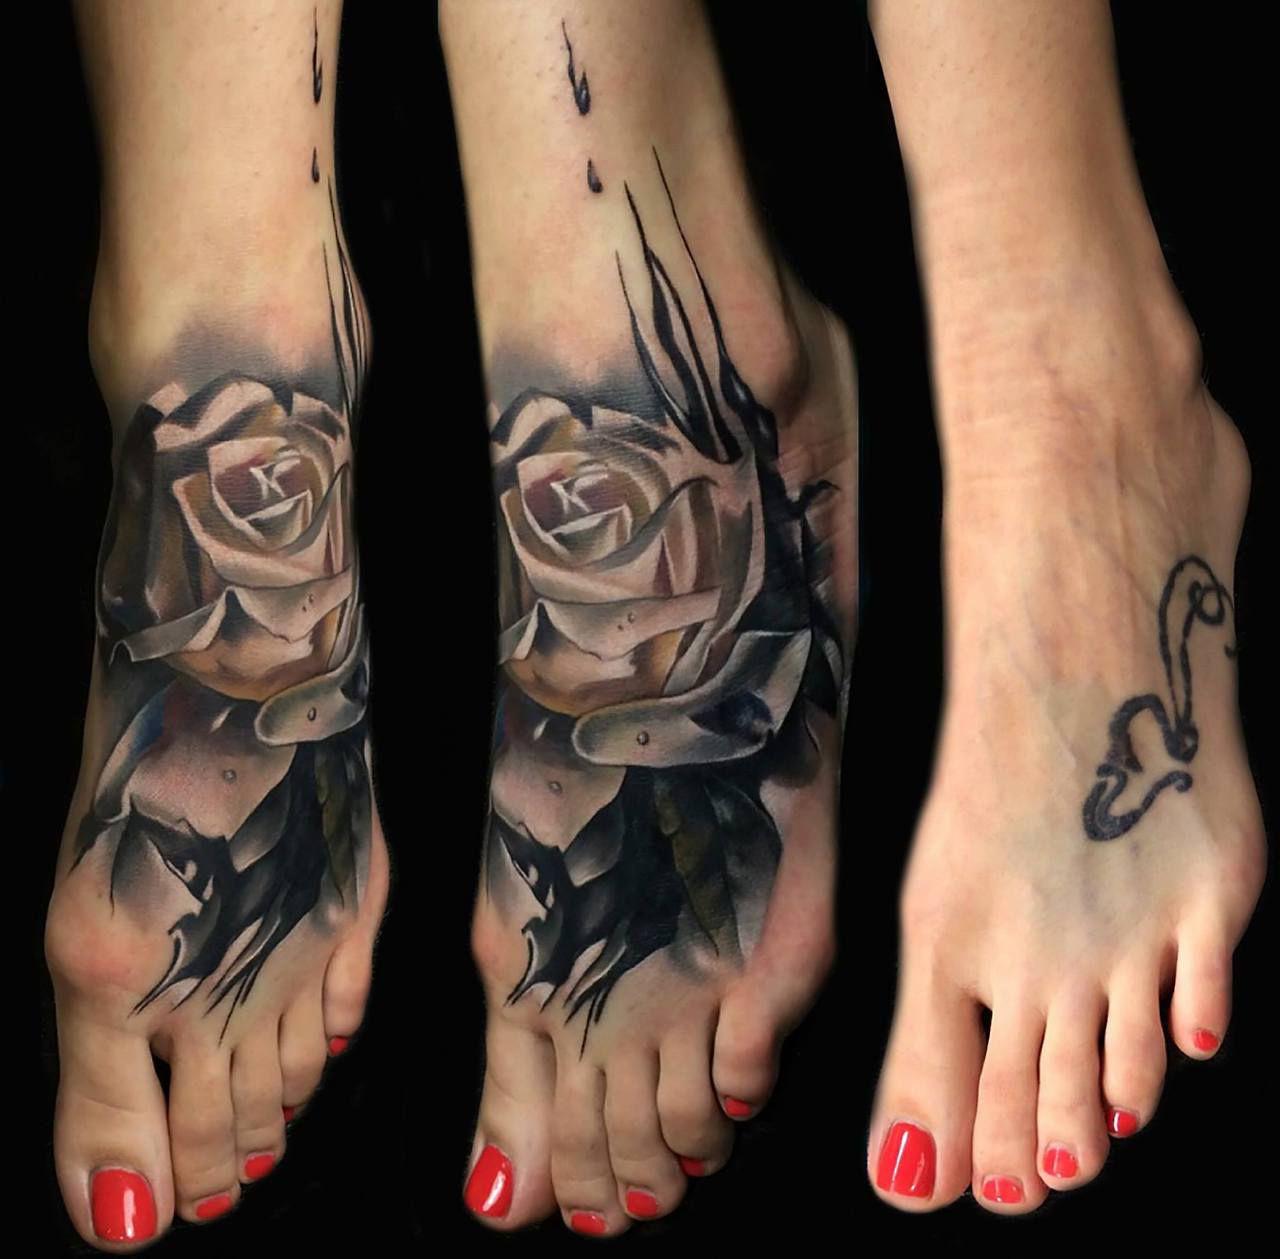 Foot Rose Cover Up tattoo design Tatuaje uv, Ocultar